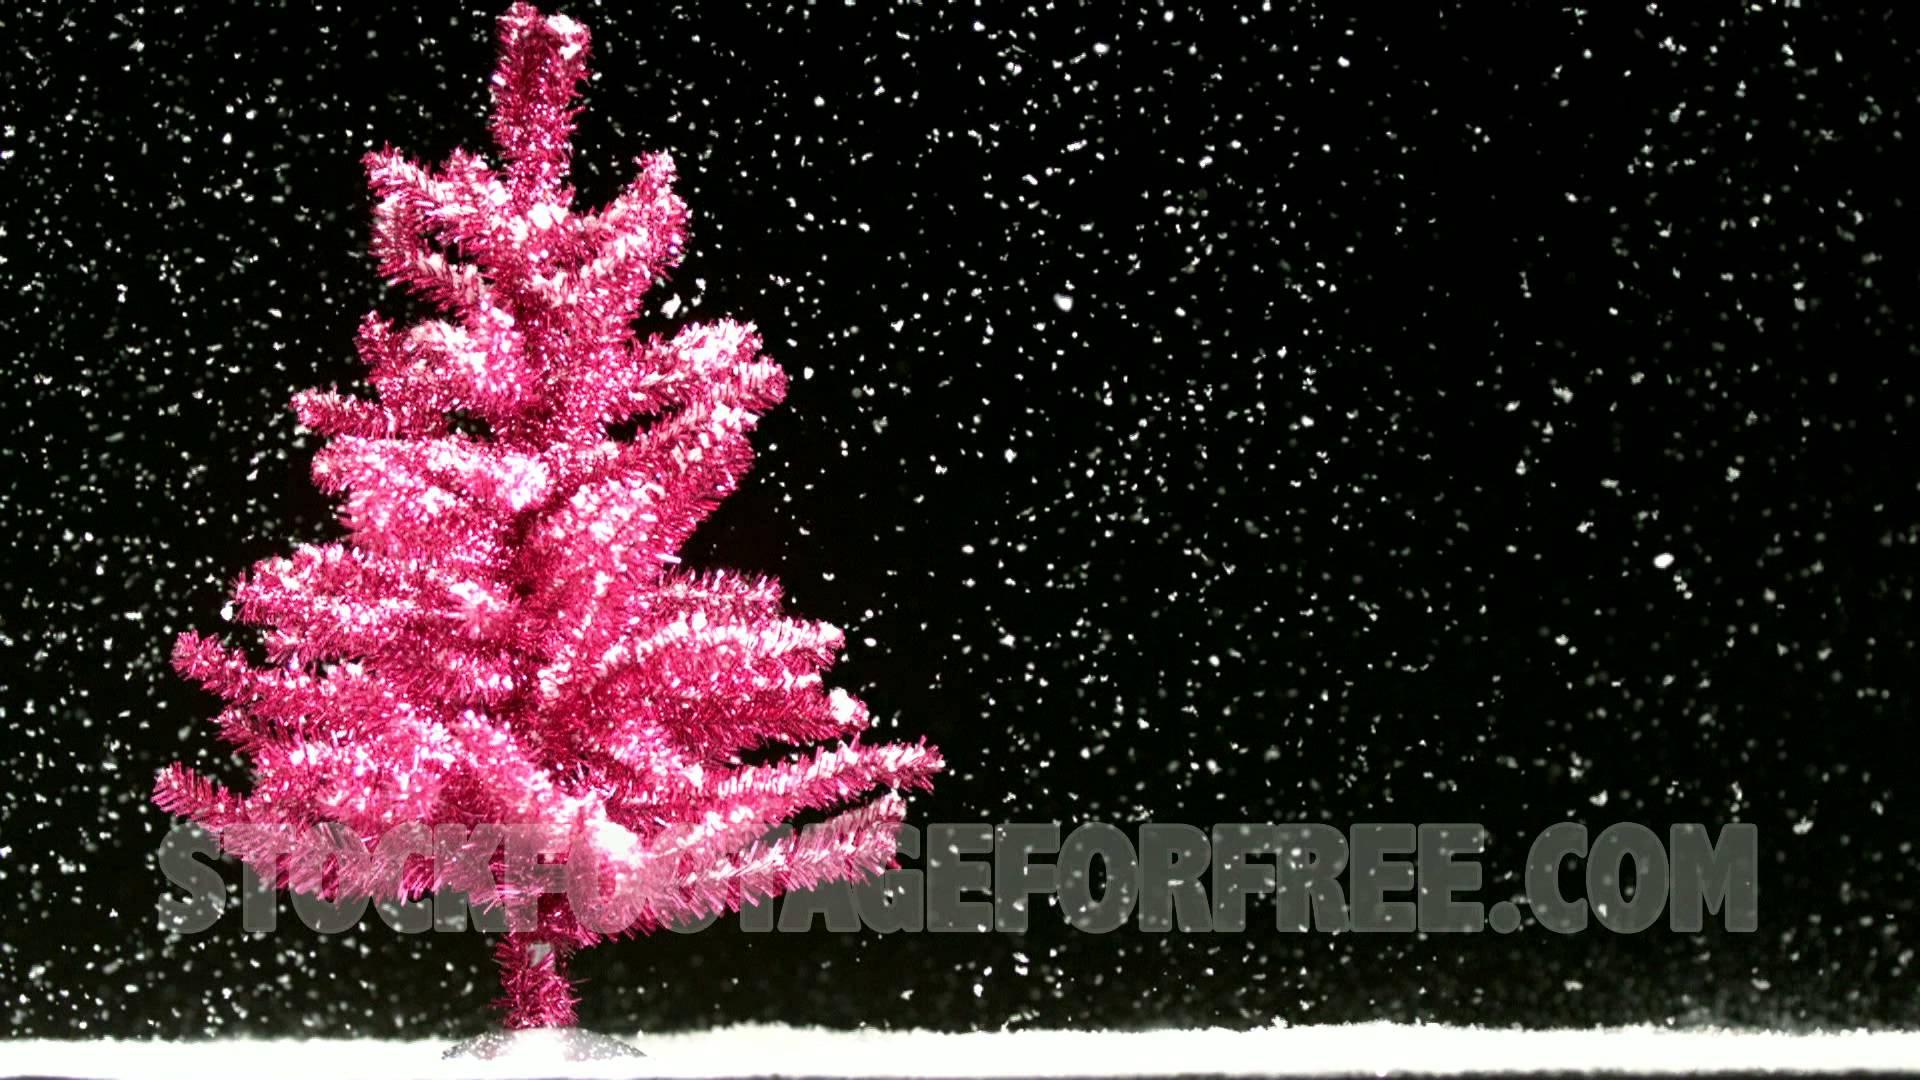 Pink Christmas Tree Wallpaper 1920x1080